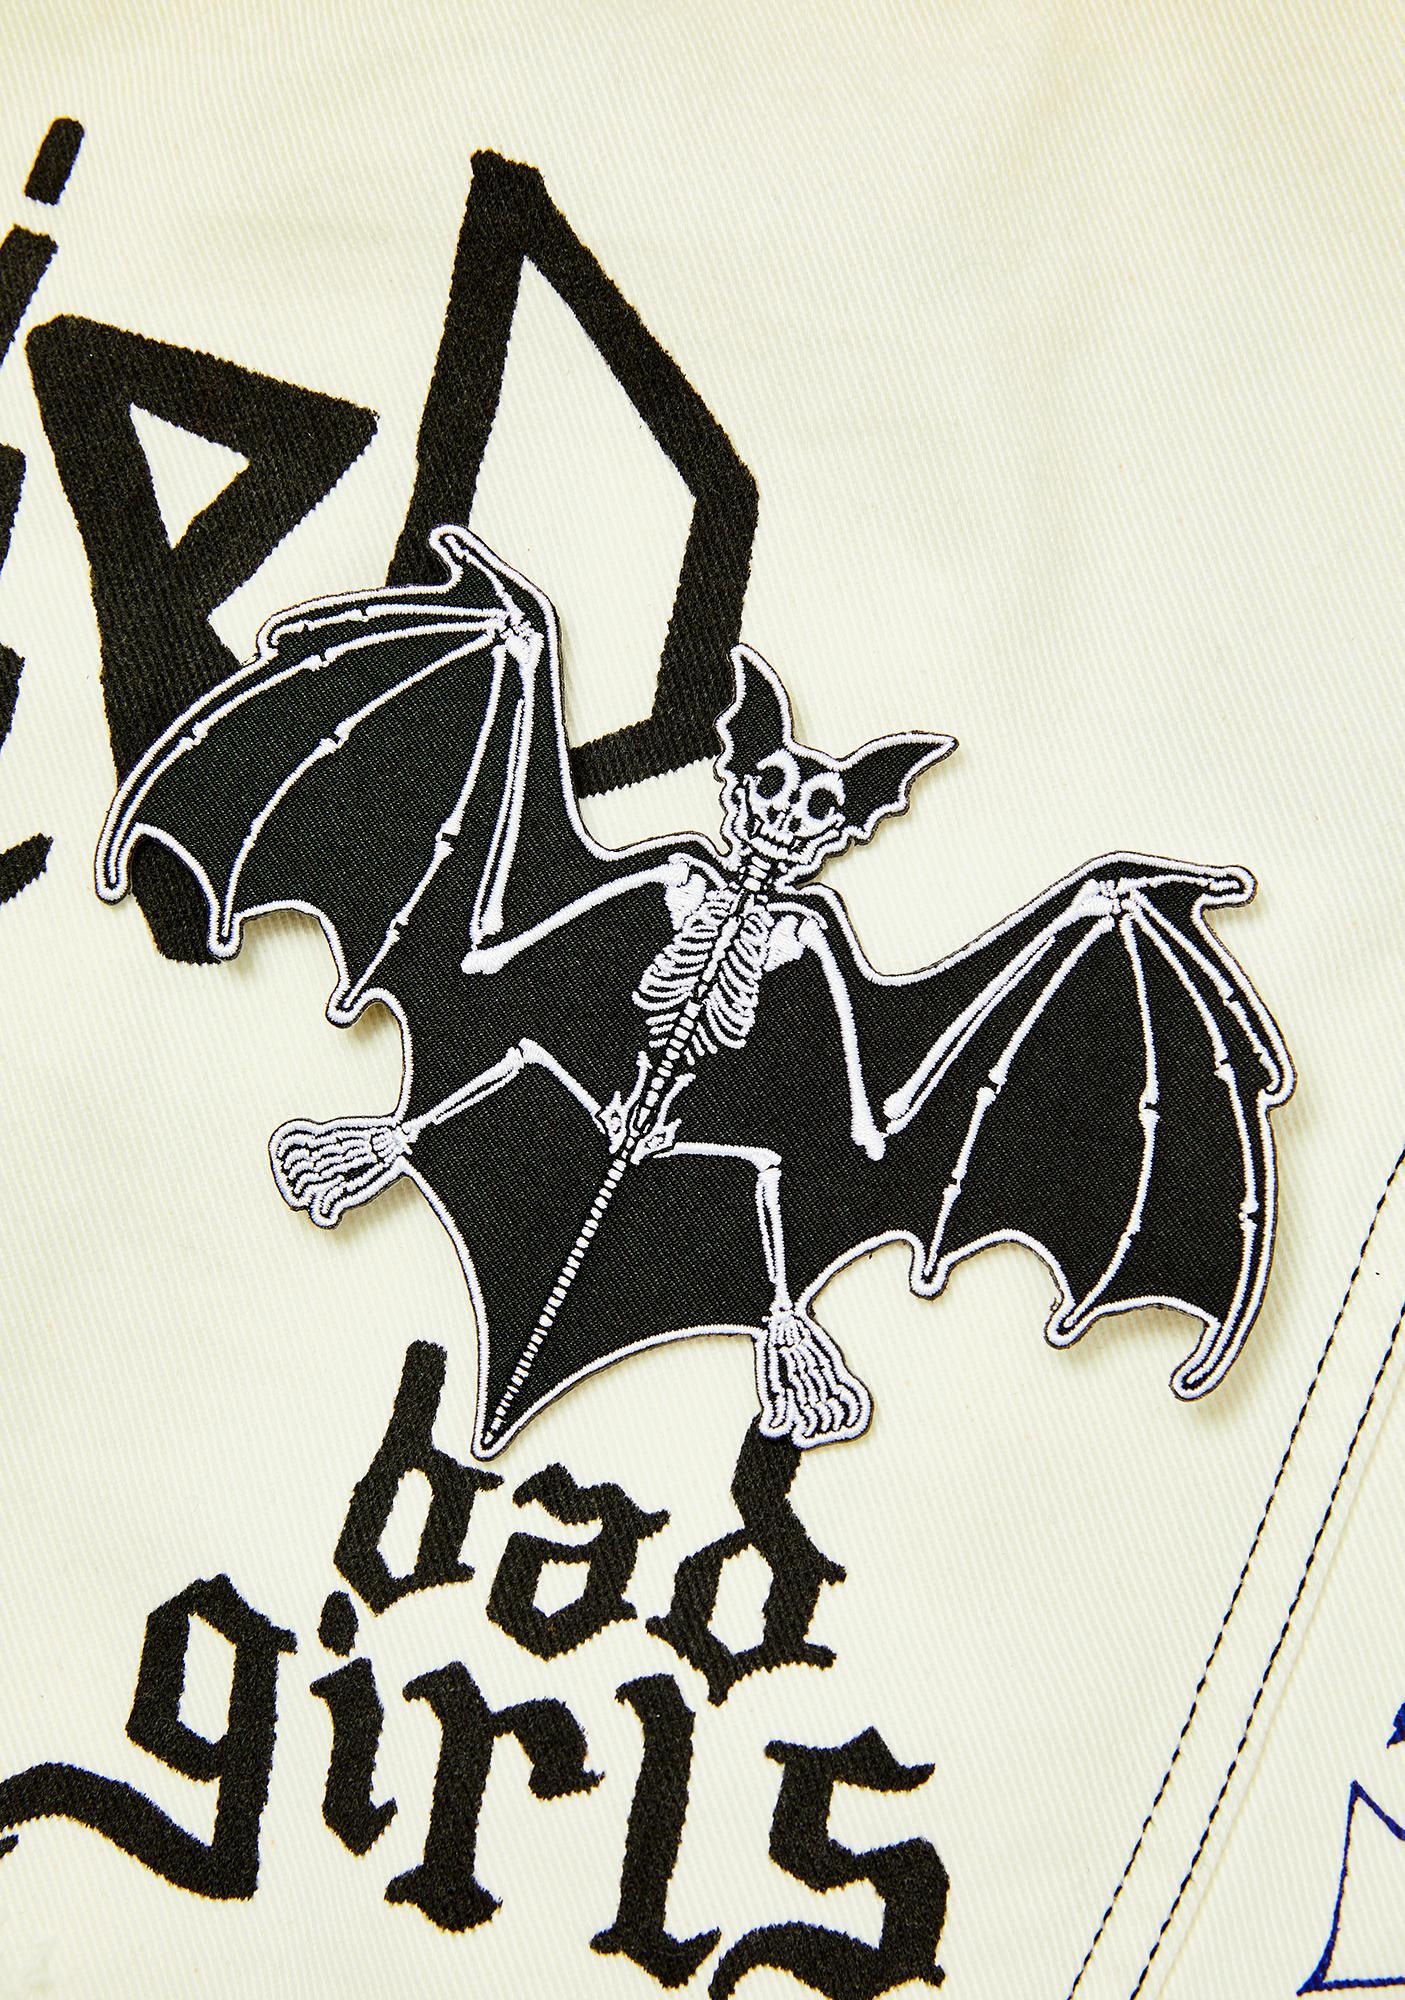 Kreepsville 666 Skelli Bones Bat Patch